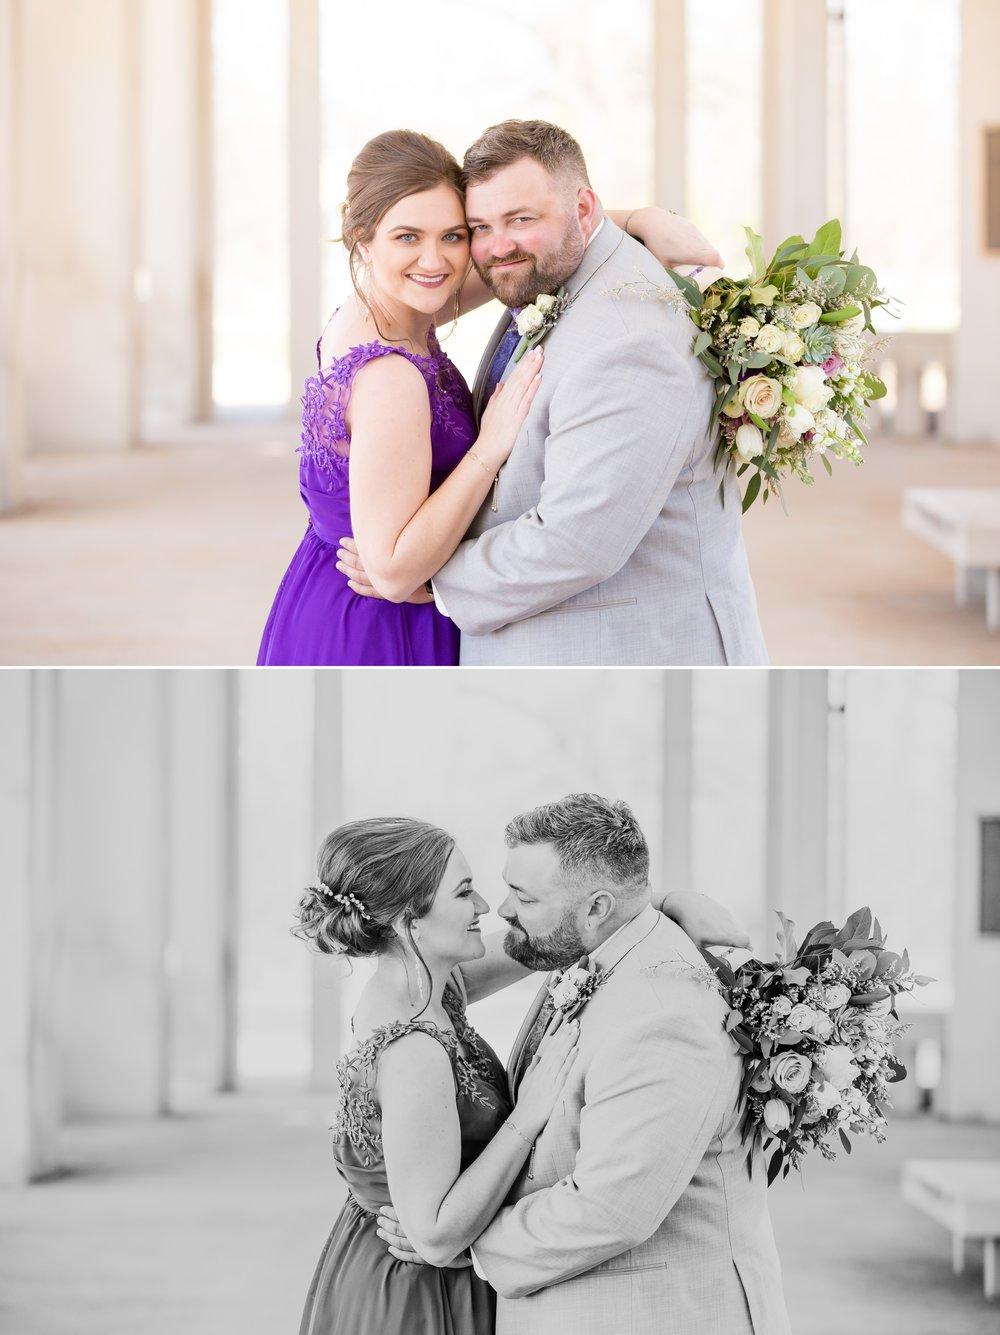 cleary wedding 19.jpg